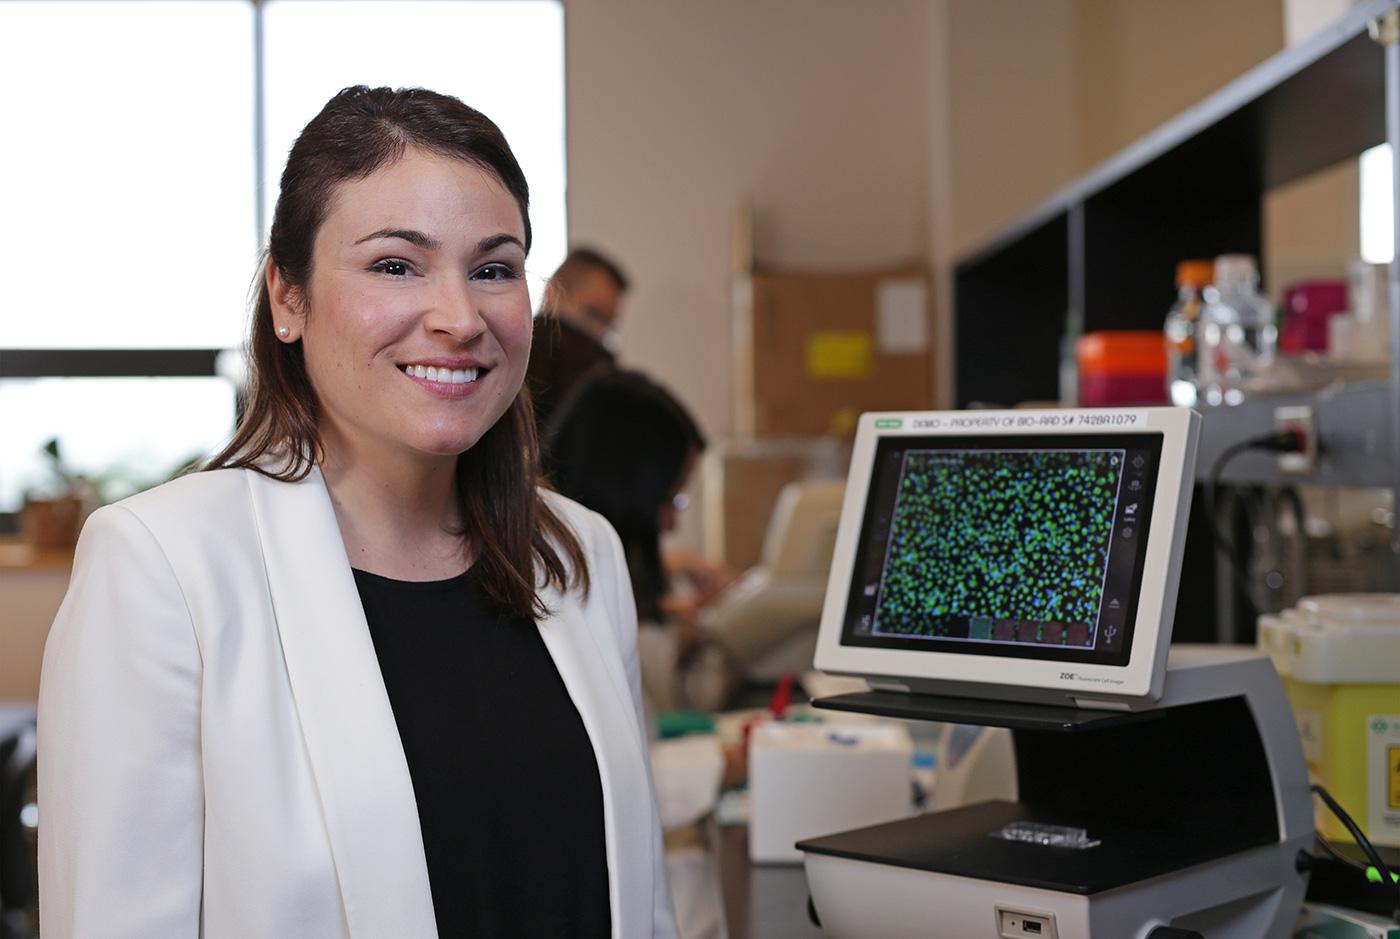 Professor Mireille Ouimet in a lab coat in front of a screen